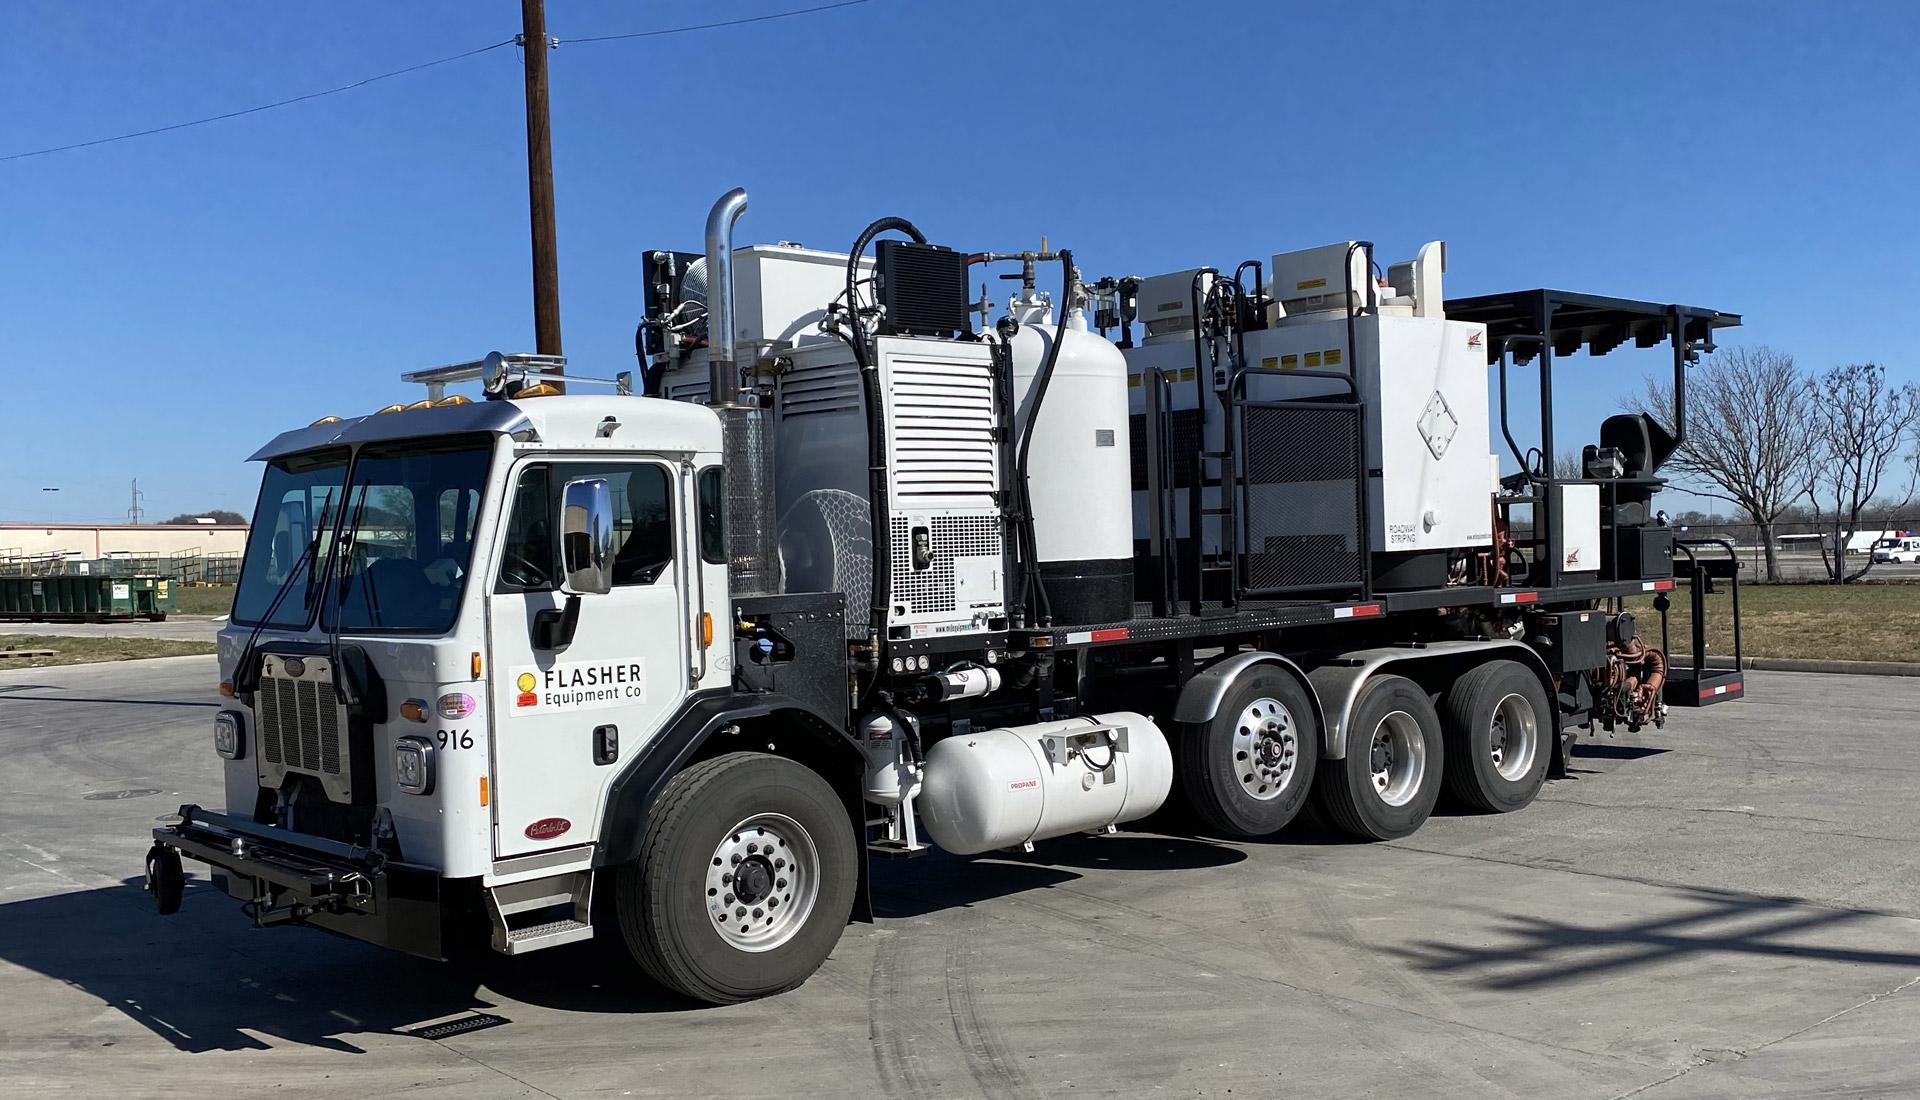 Flasher Equipment Company Thermoplastic Truck